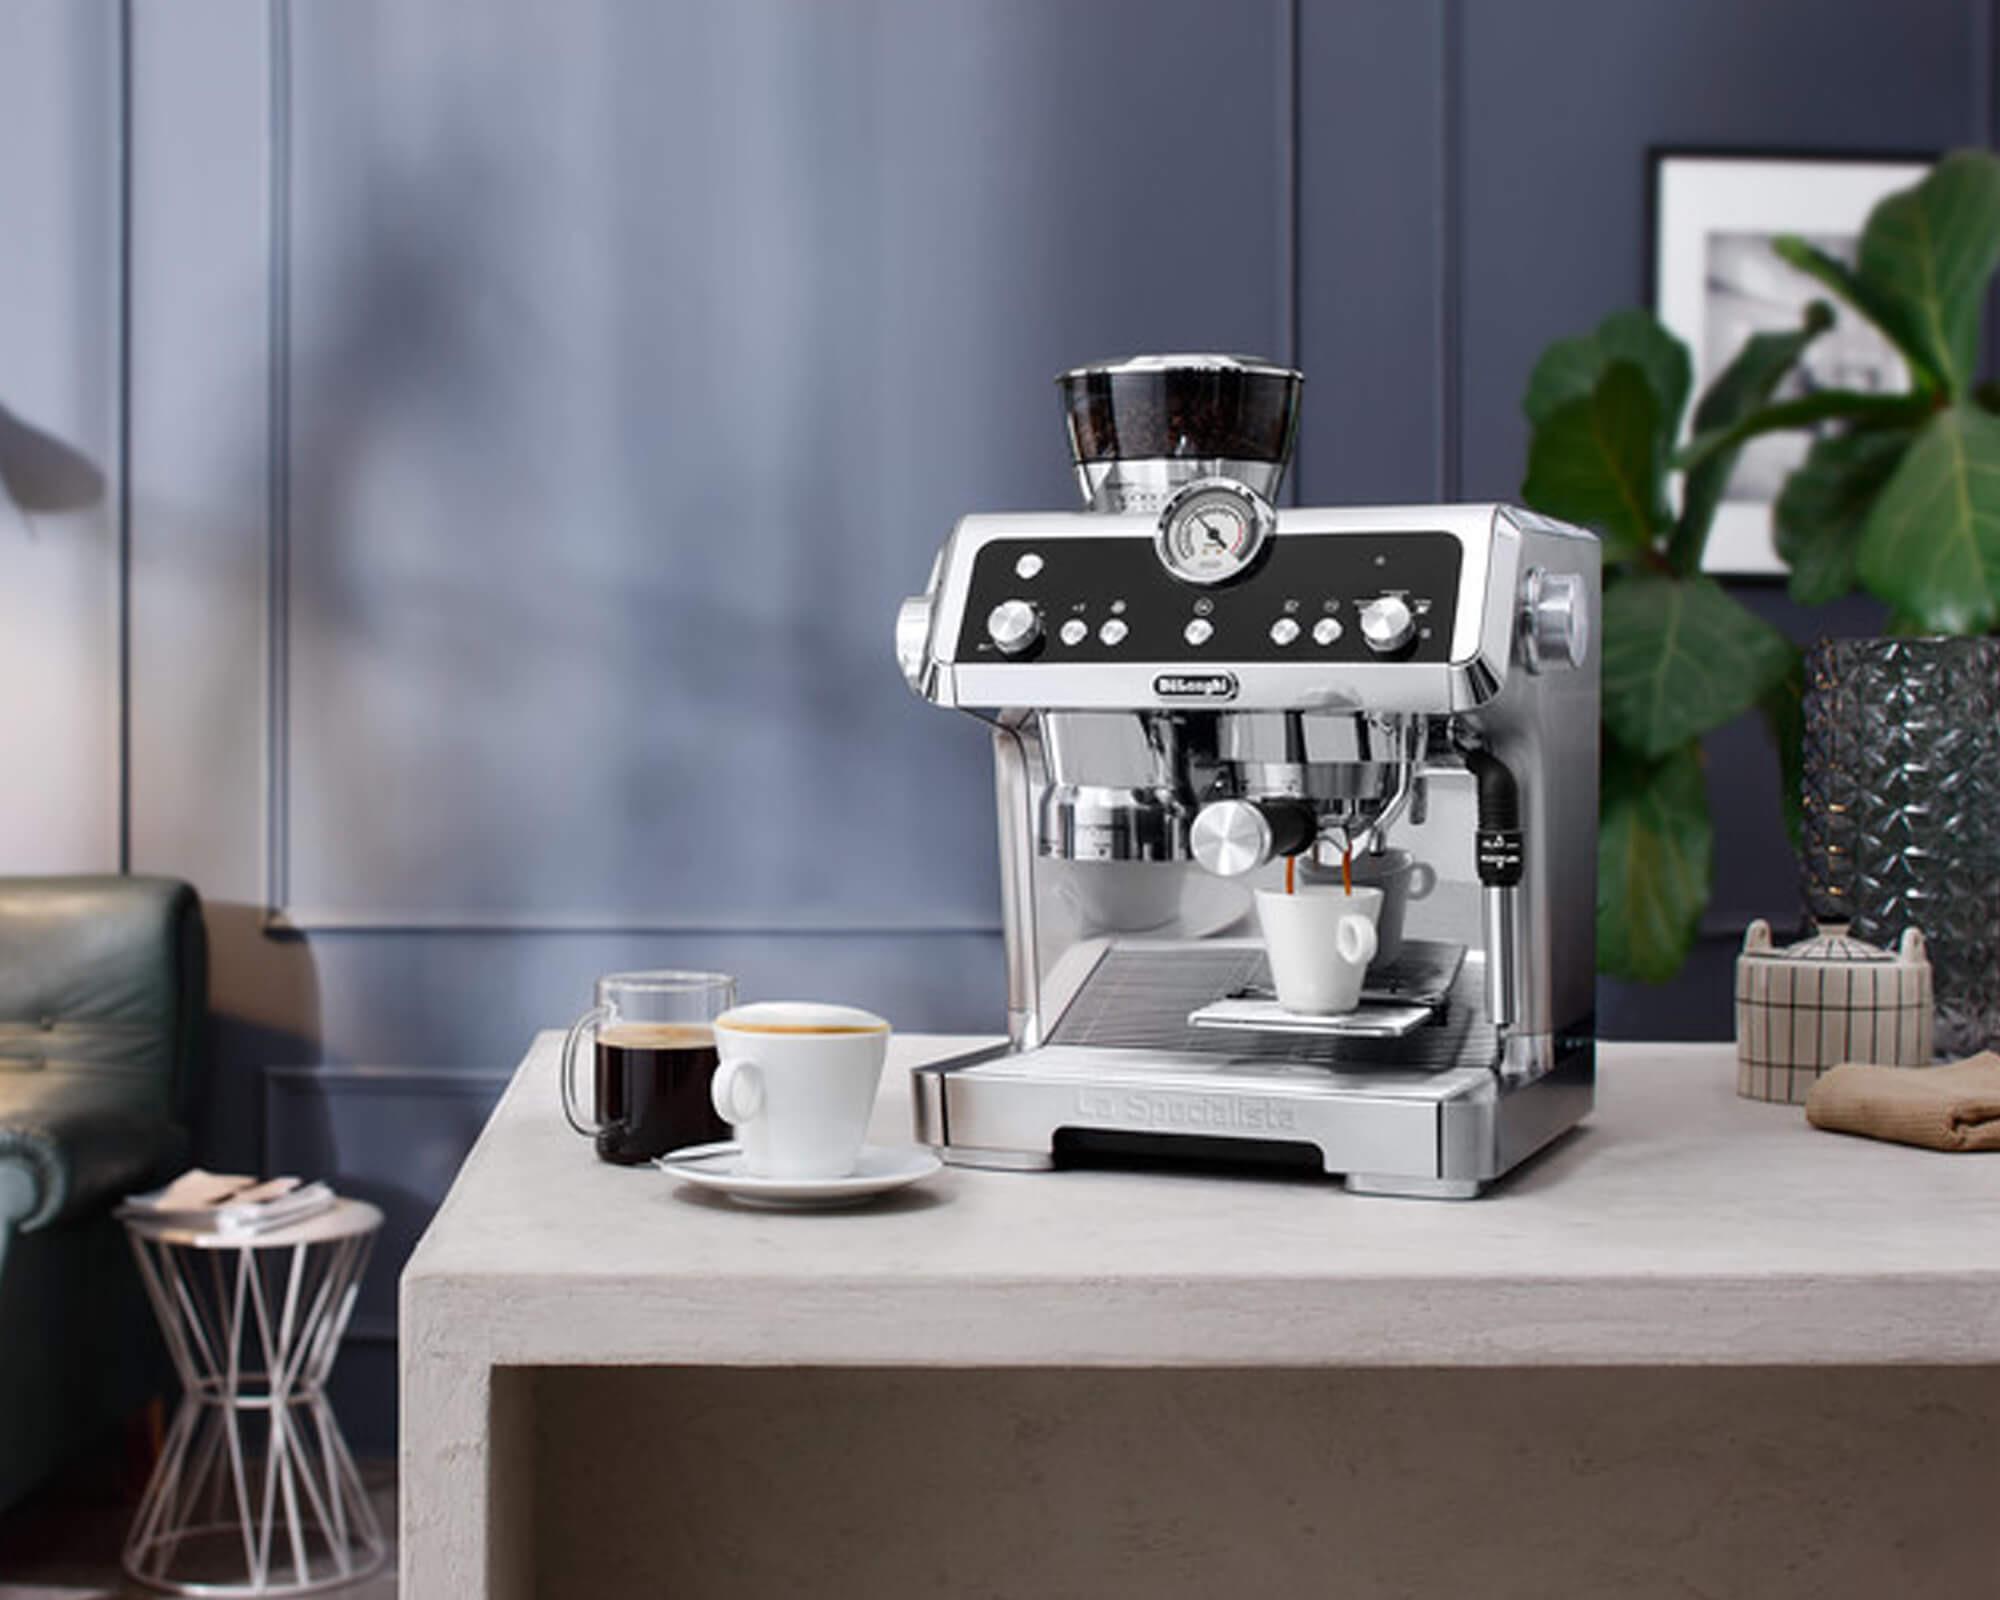 Machine expresso DELONGHI SPECIALISTA moulin integré I Café Michel